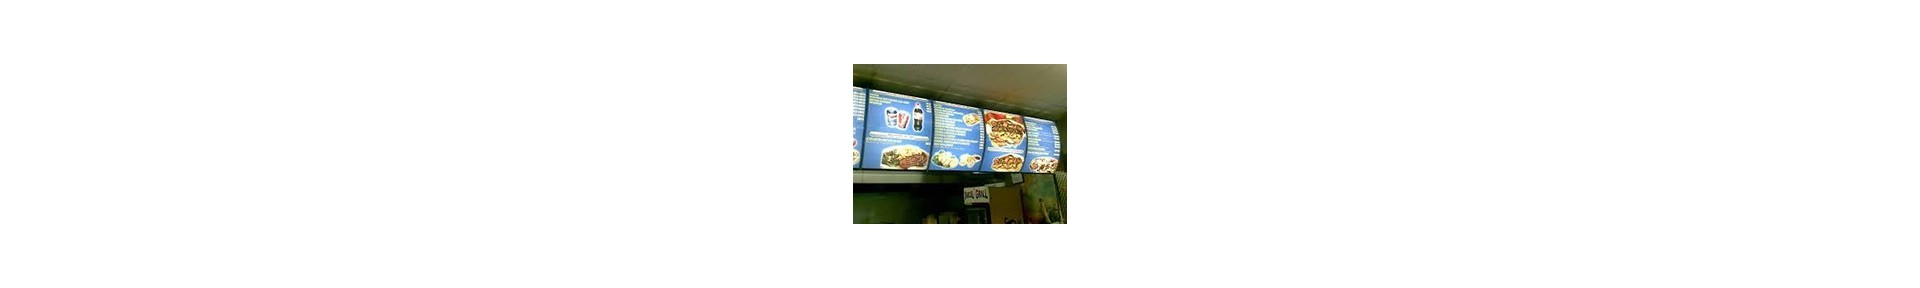 Restaurant Menu Boards | Digital Menu boards | Lightboxes